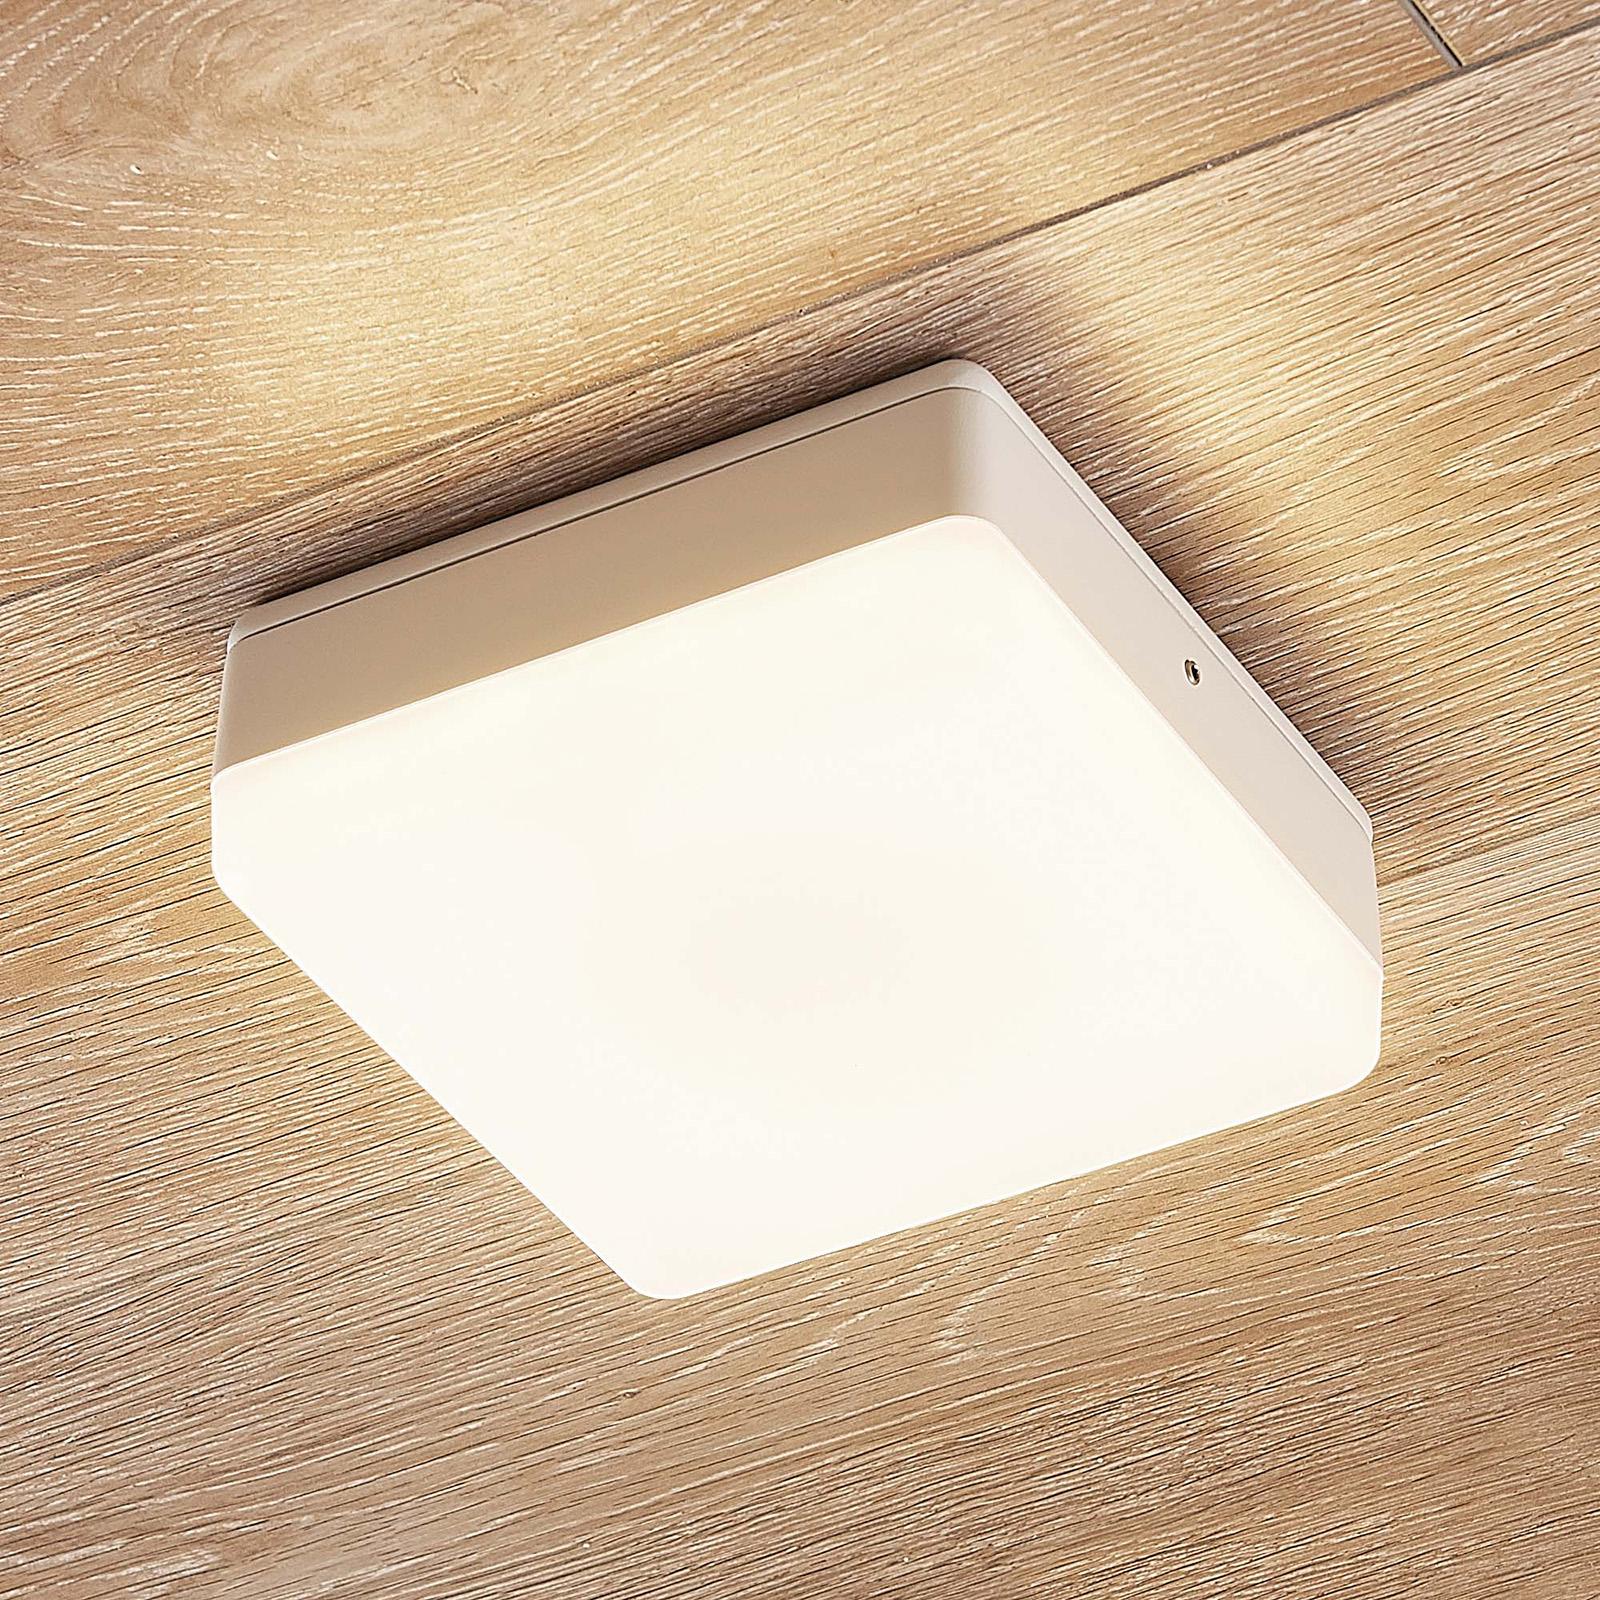 Acquista Plafoniera LED Thilo, IP54, bianca, 16cm, sensore